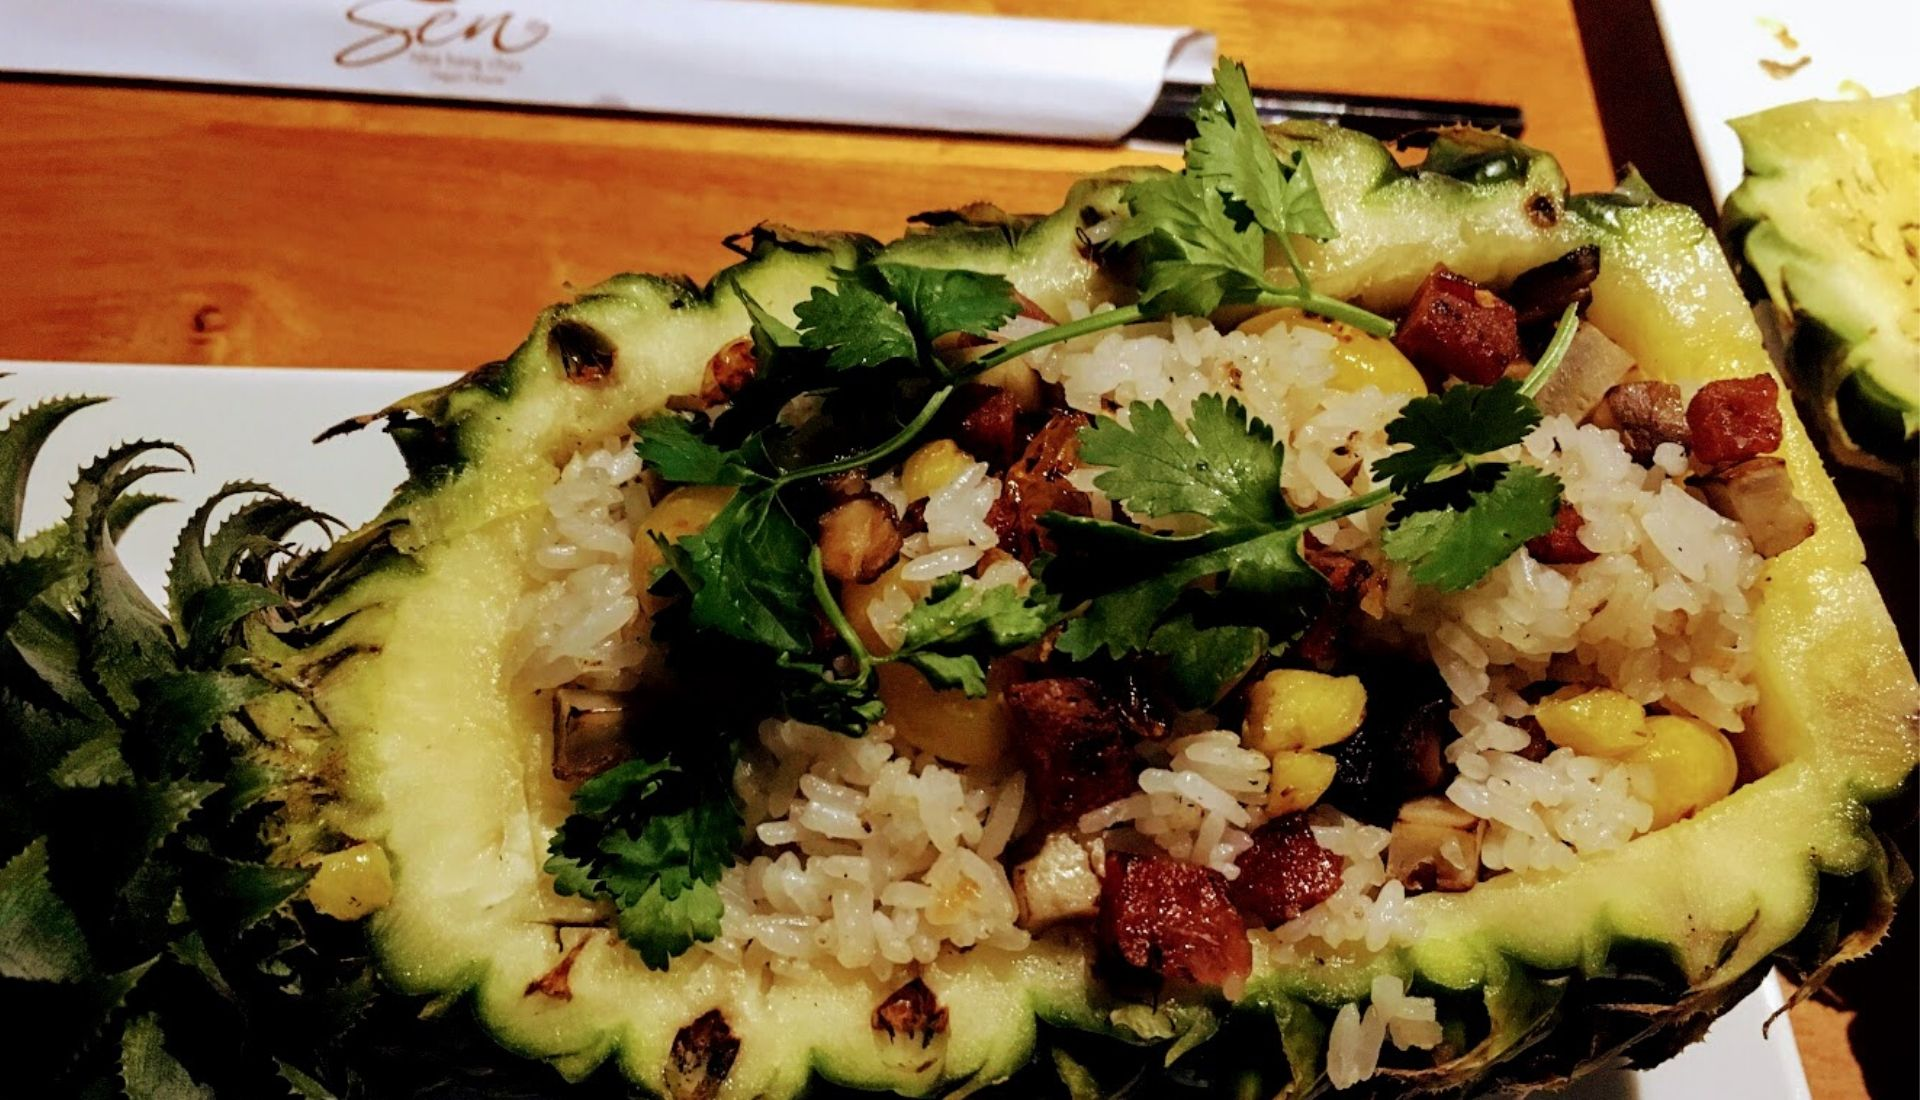 Vegetarian food at Sen Restaurant